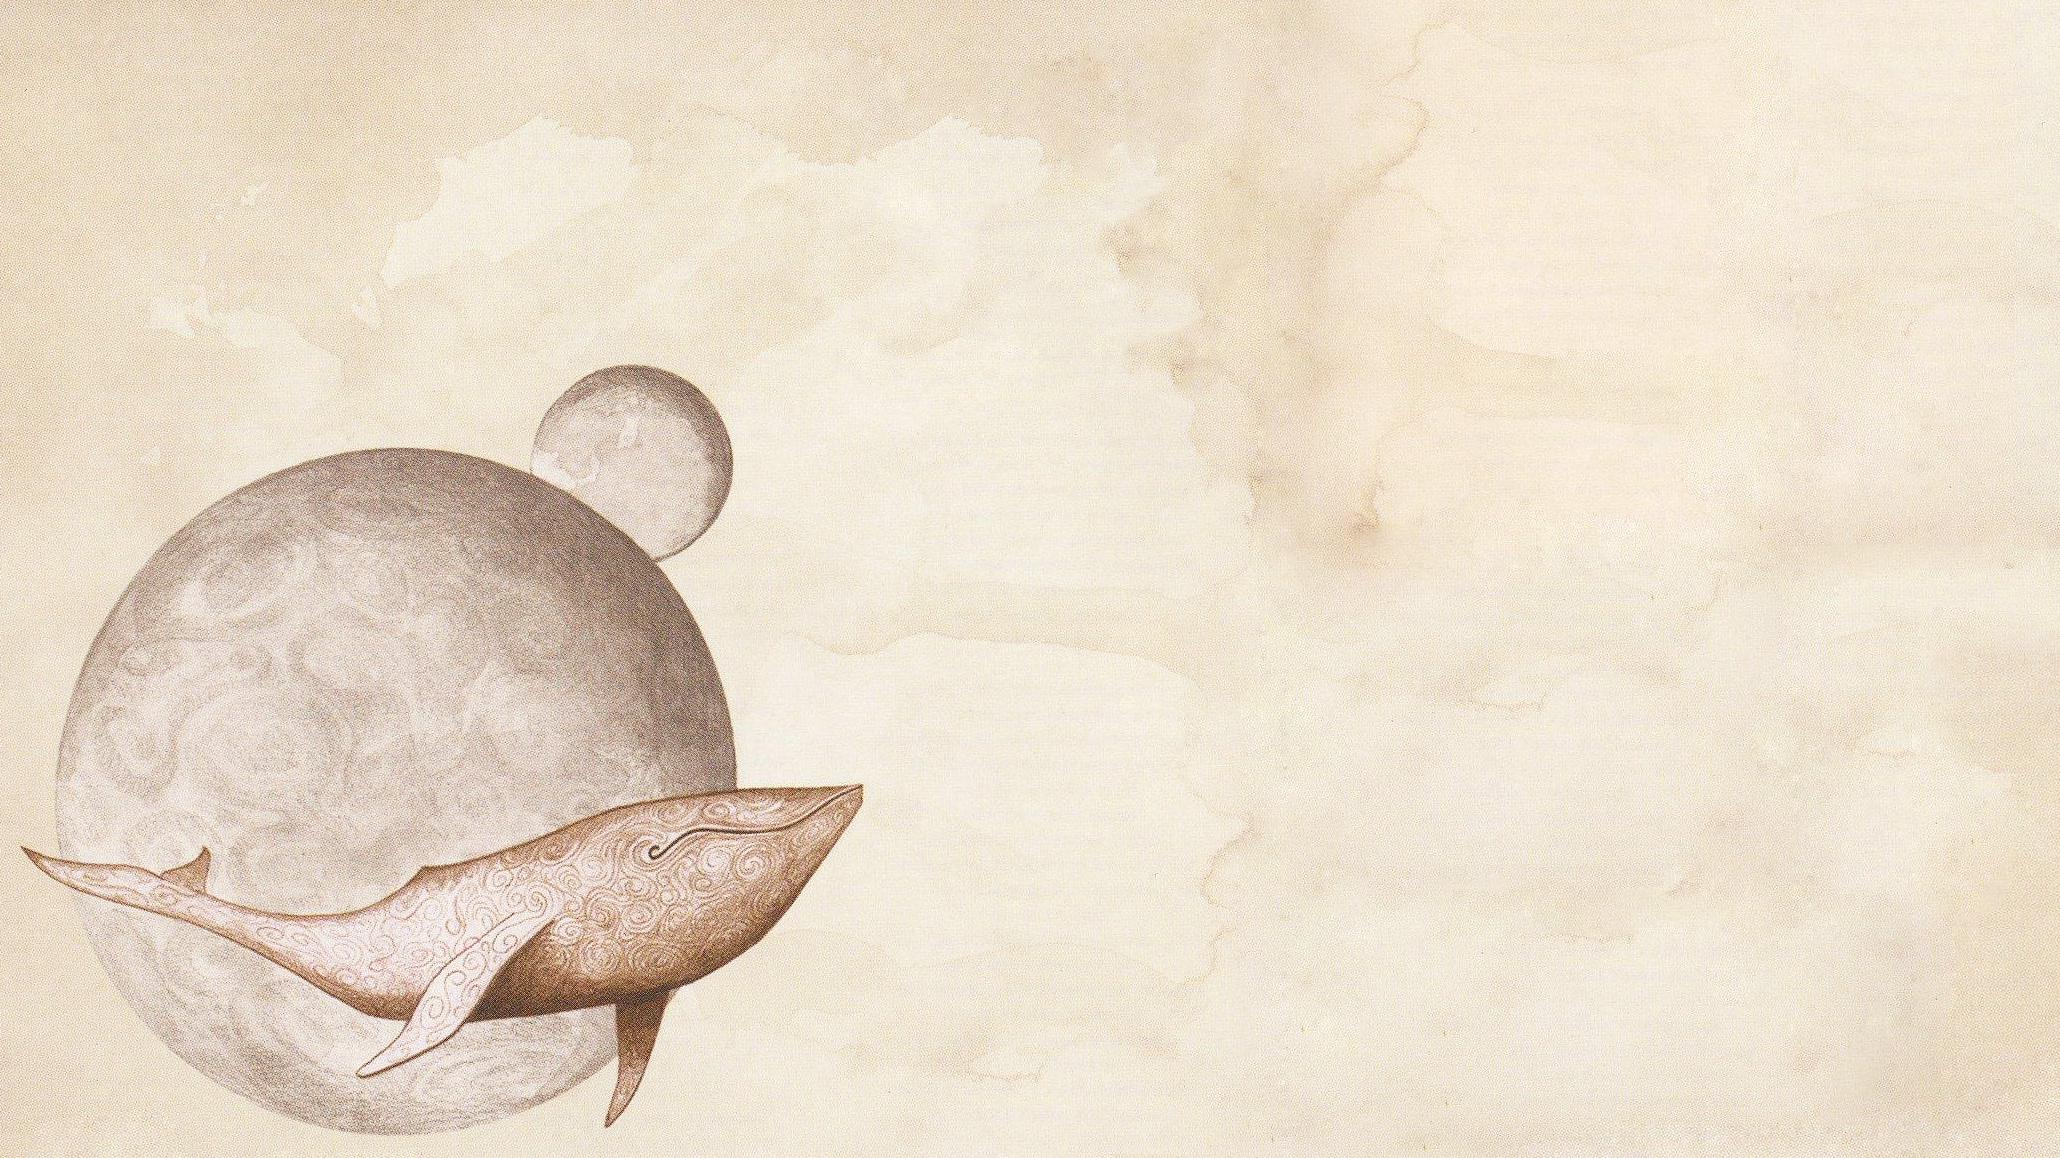 75] Gojira Wallpaper on WallpaperSafari 2060x1158